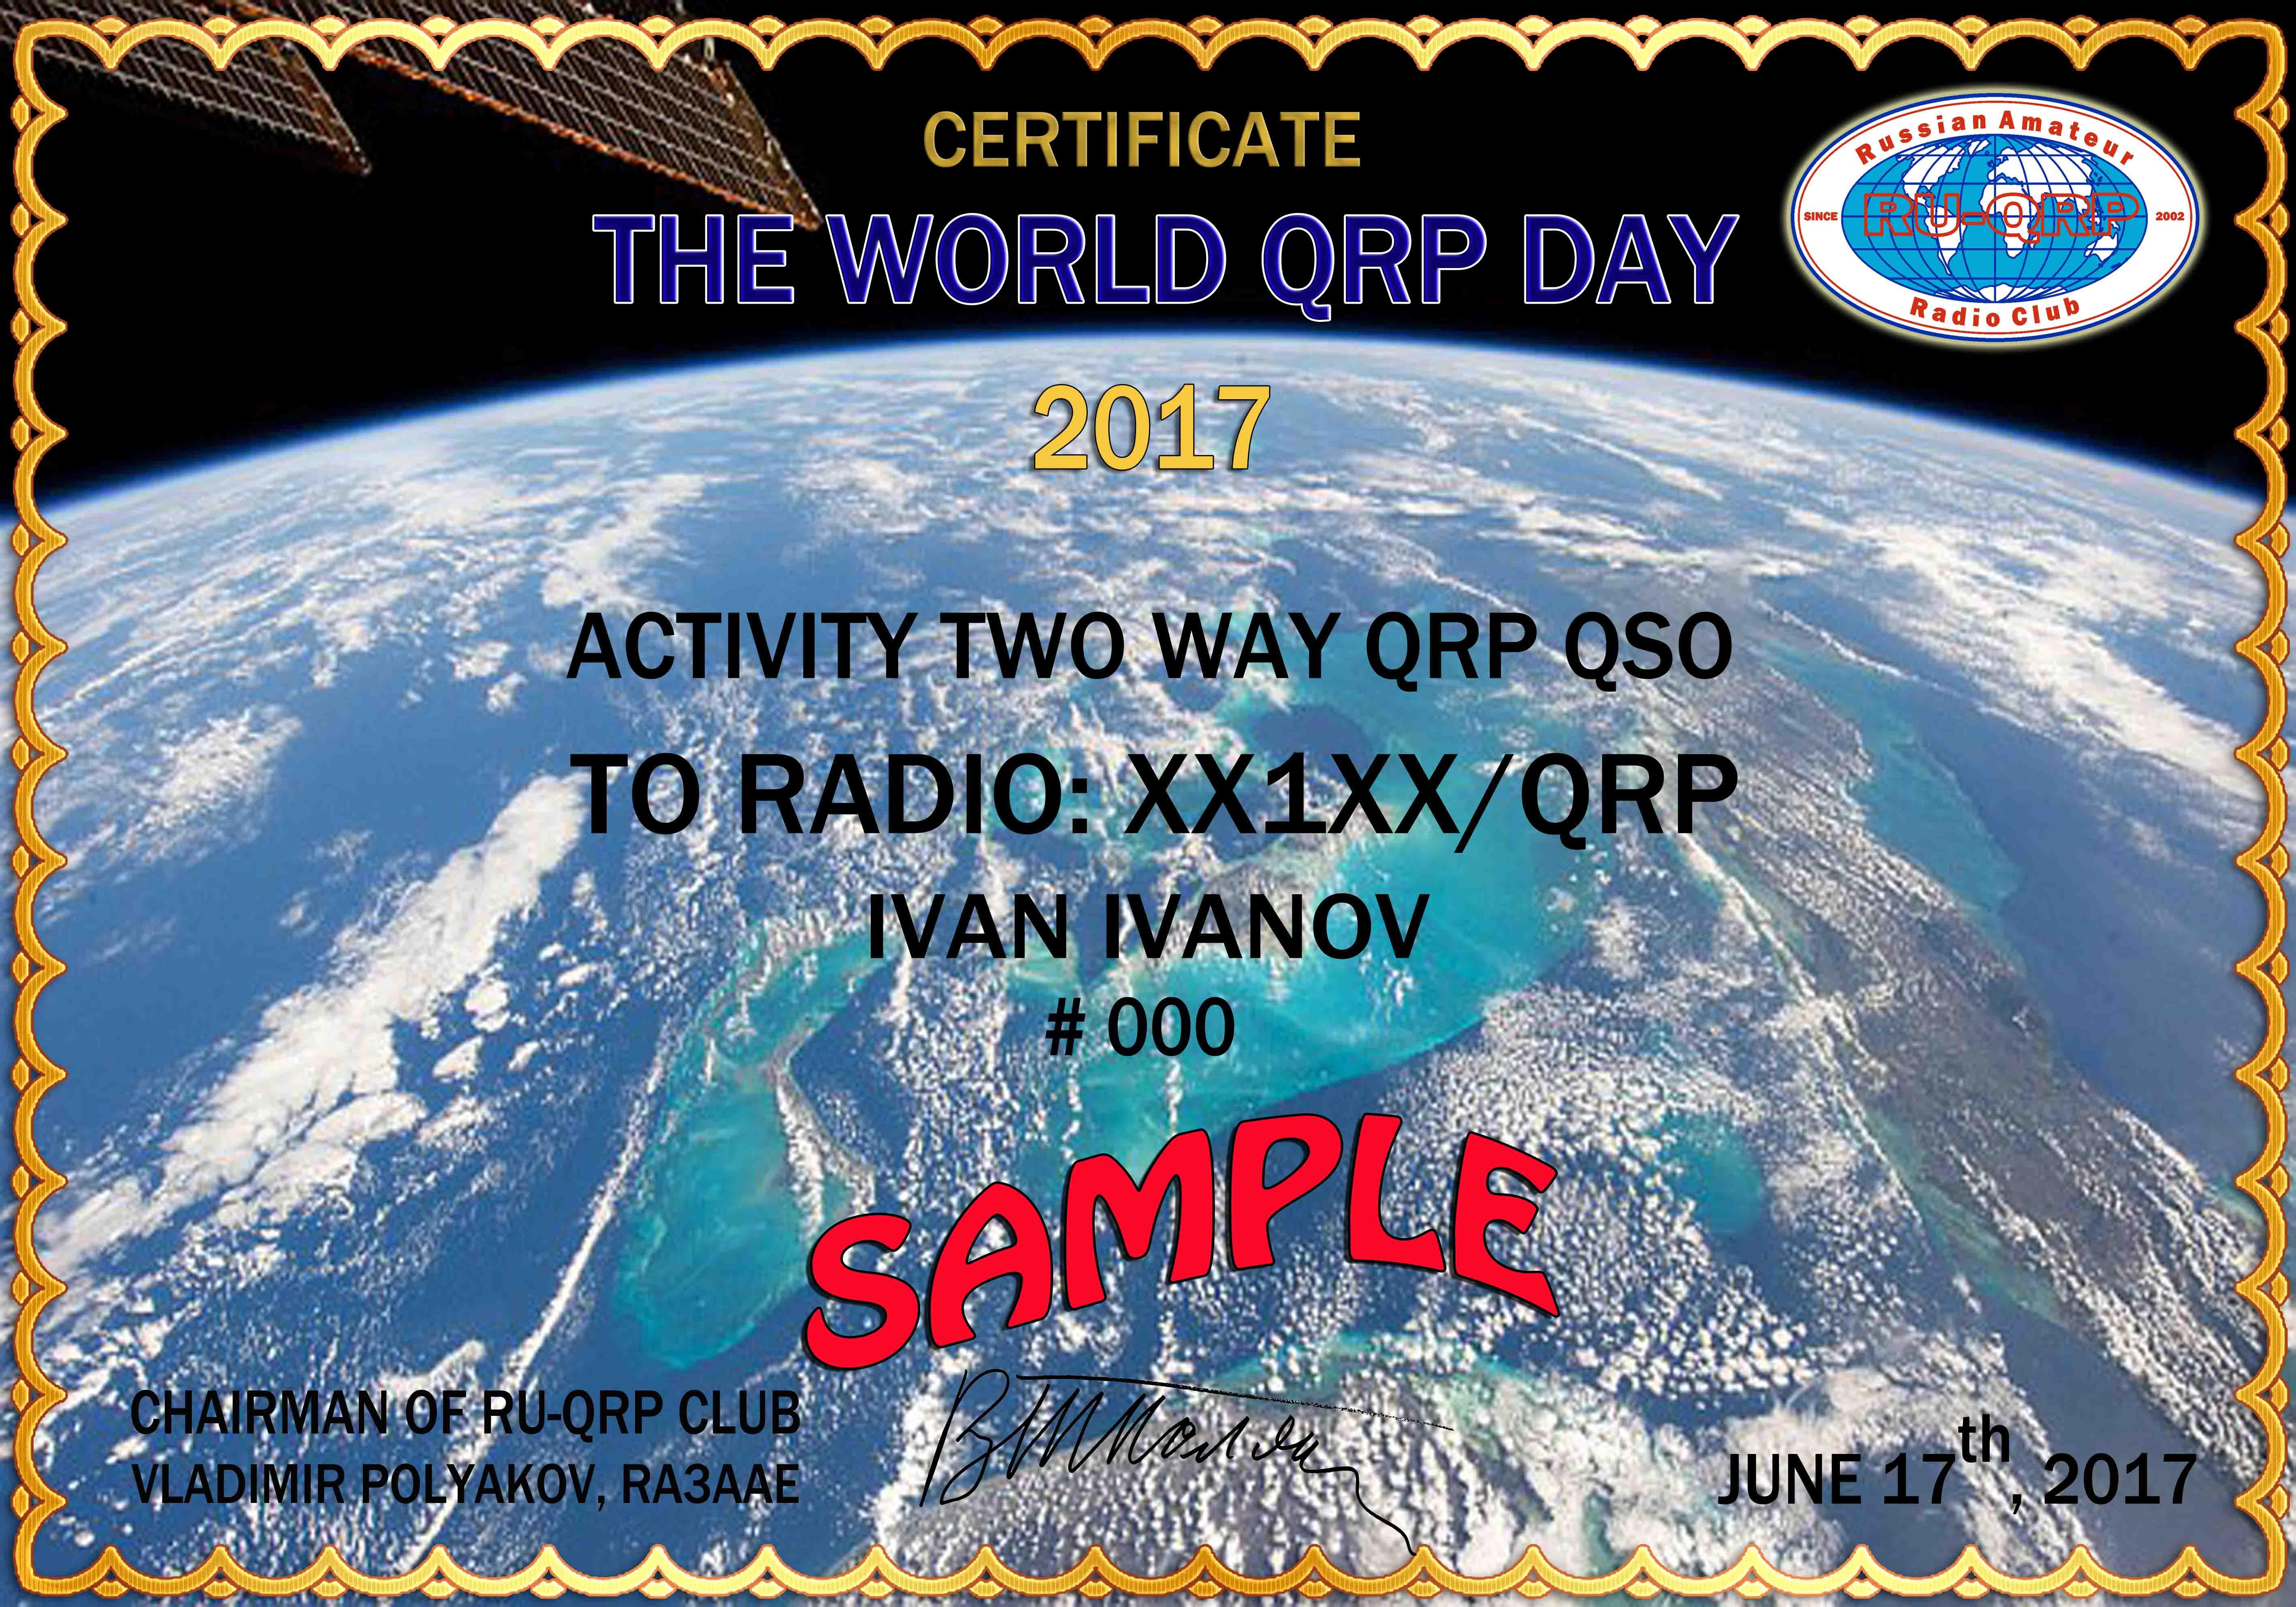 Нажмите на изображение для увеличения.  Название:QRP DAY 17-06-2017.jpg Просмотров:4 Размер:860.4 Кб ID:190030